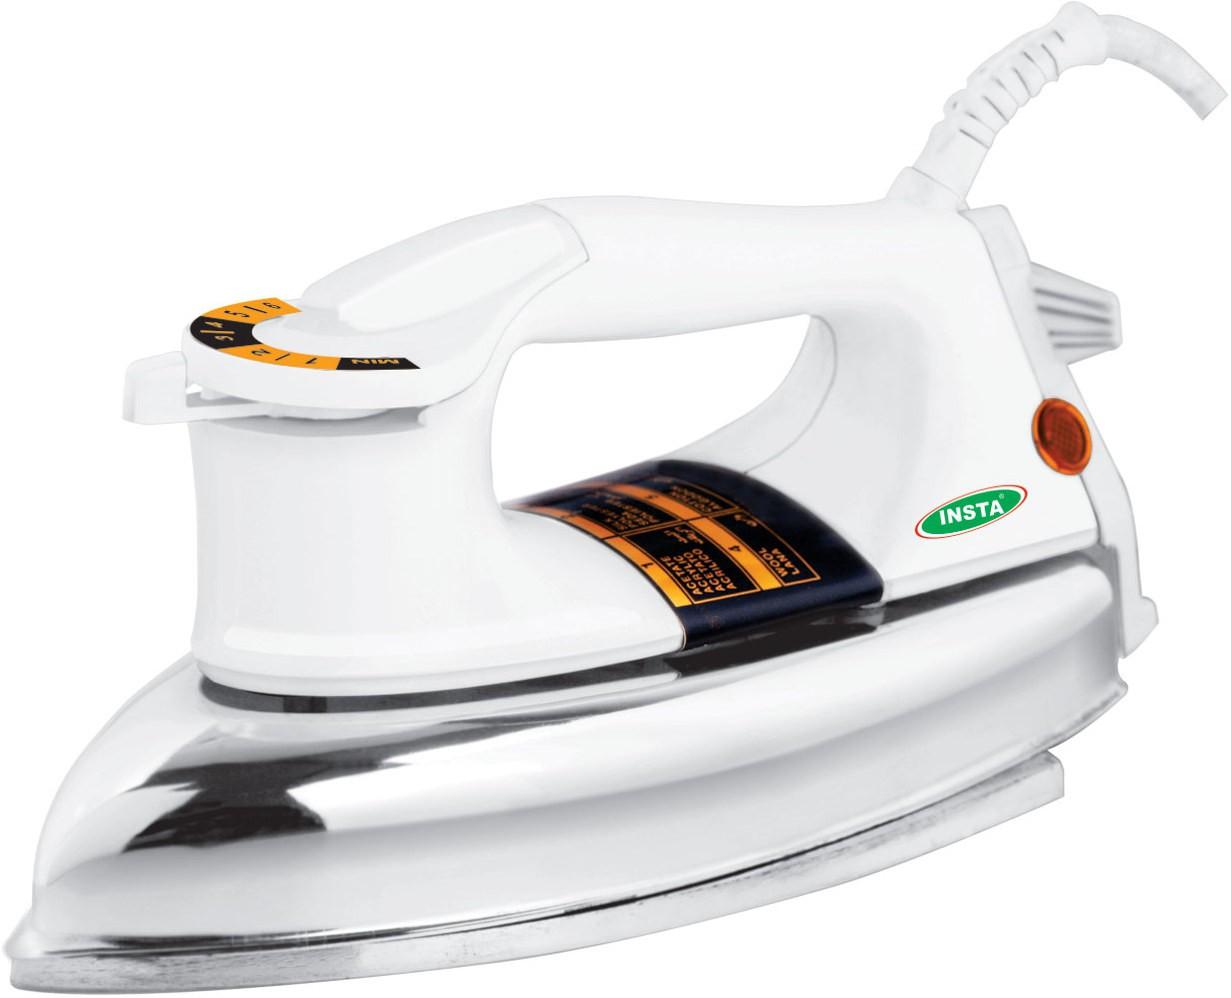 View Insta Plancha Heavy Dry Iron(SilverWhite) Home Appliances Price Online(Insta)